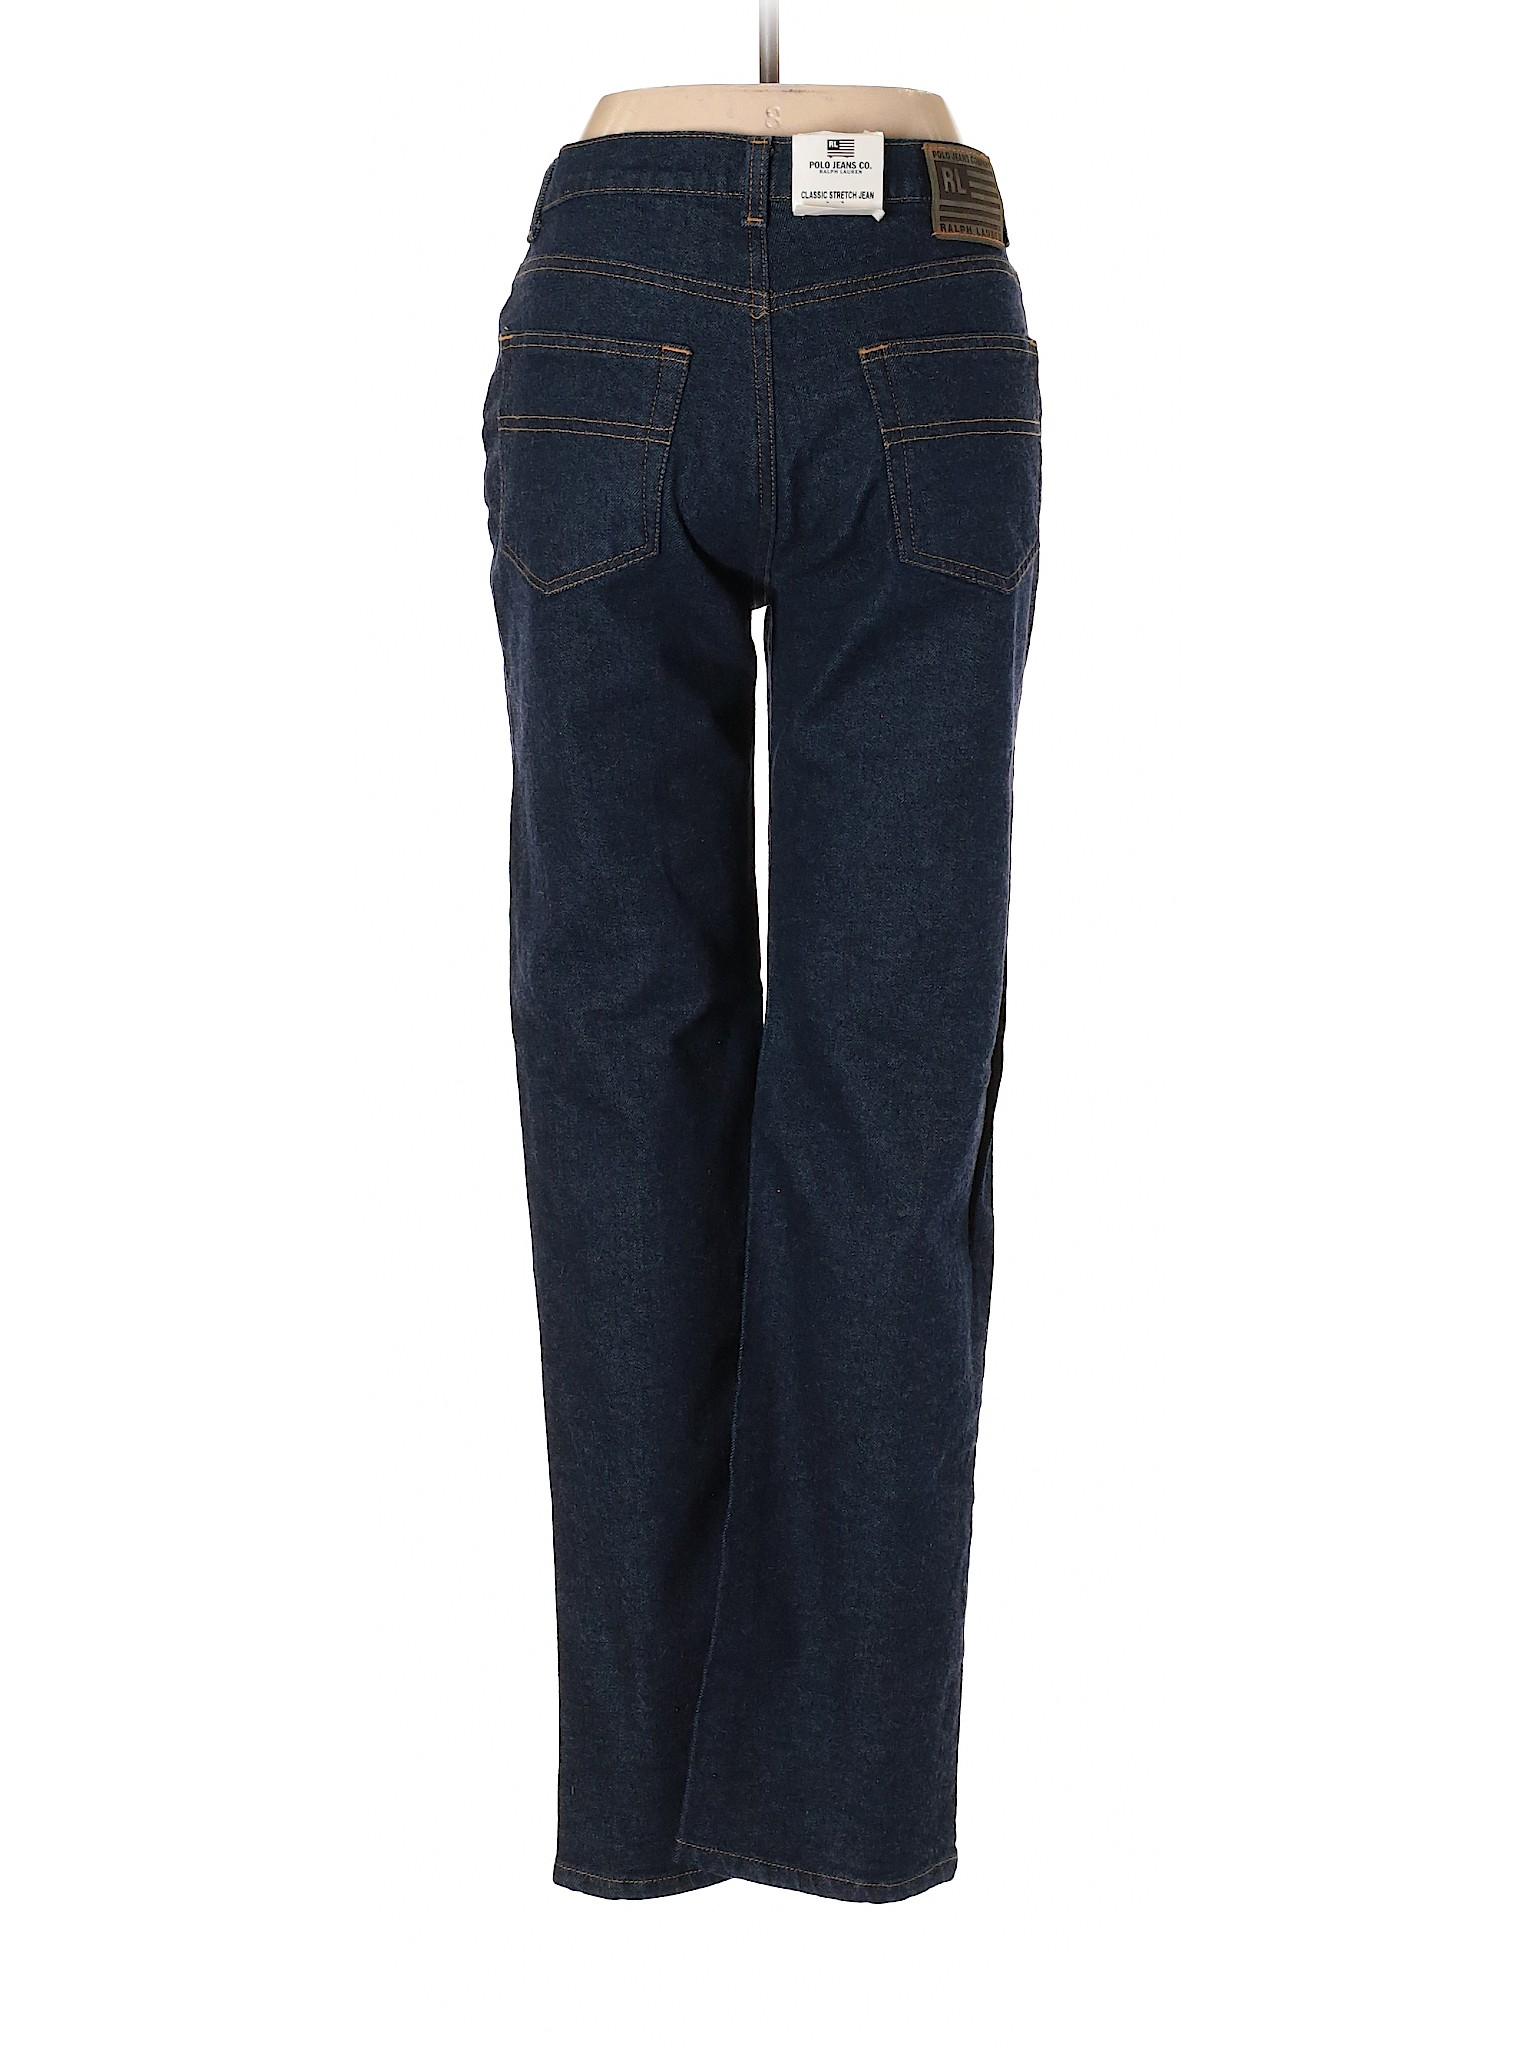 Polo Lauren Ralph by Promotion yaa5xcwICN Jeans xRSddwXqC